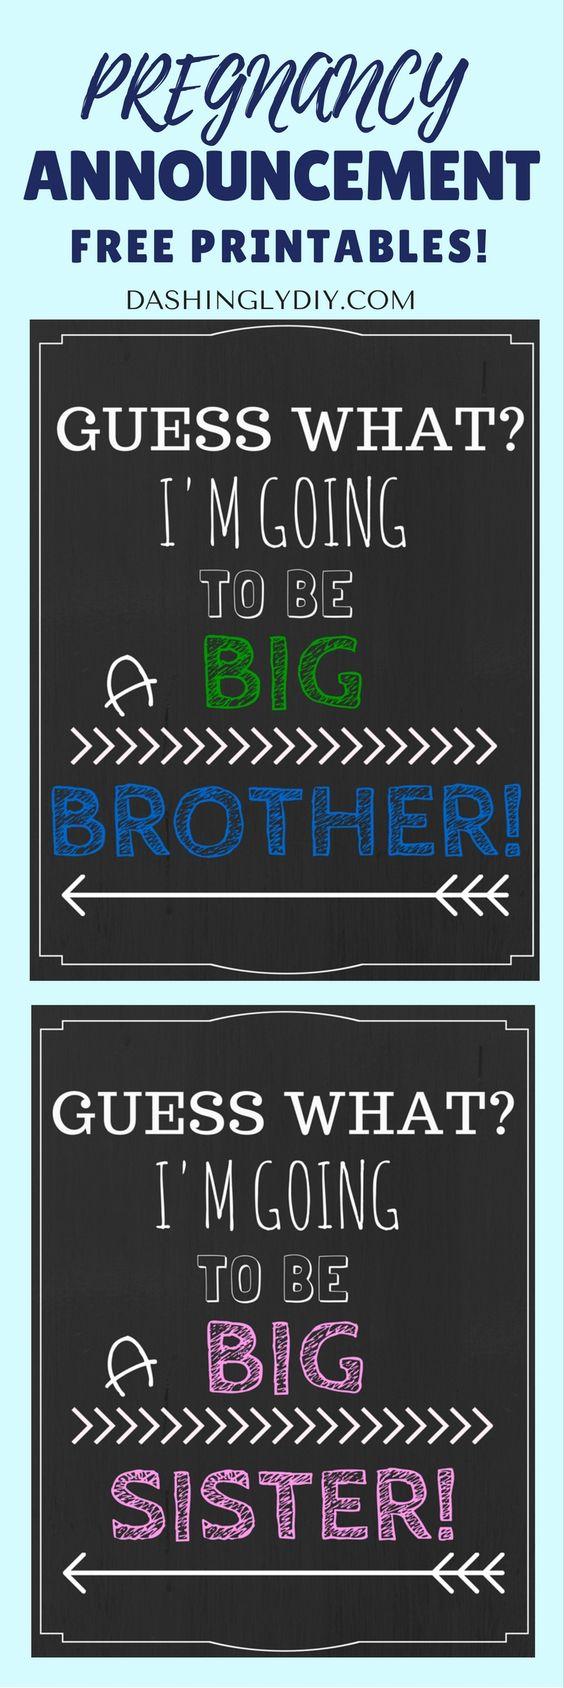 "Free printables for announcing pregnancy via dashinglydiy.com. ""I'm Going to Be a Big Brother/Big Sister"". So cute!"